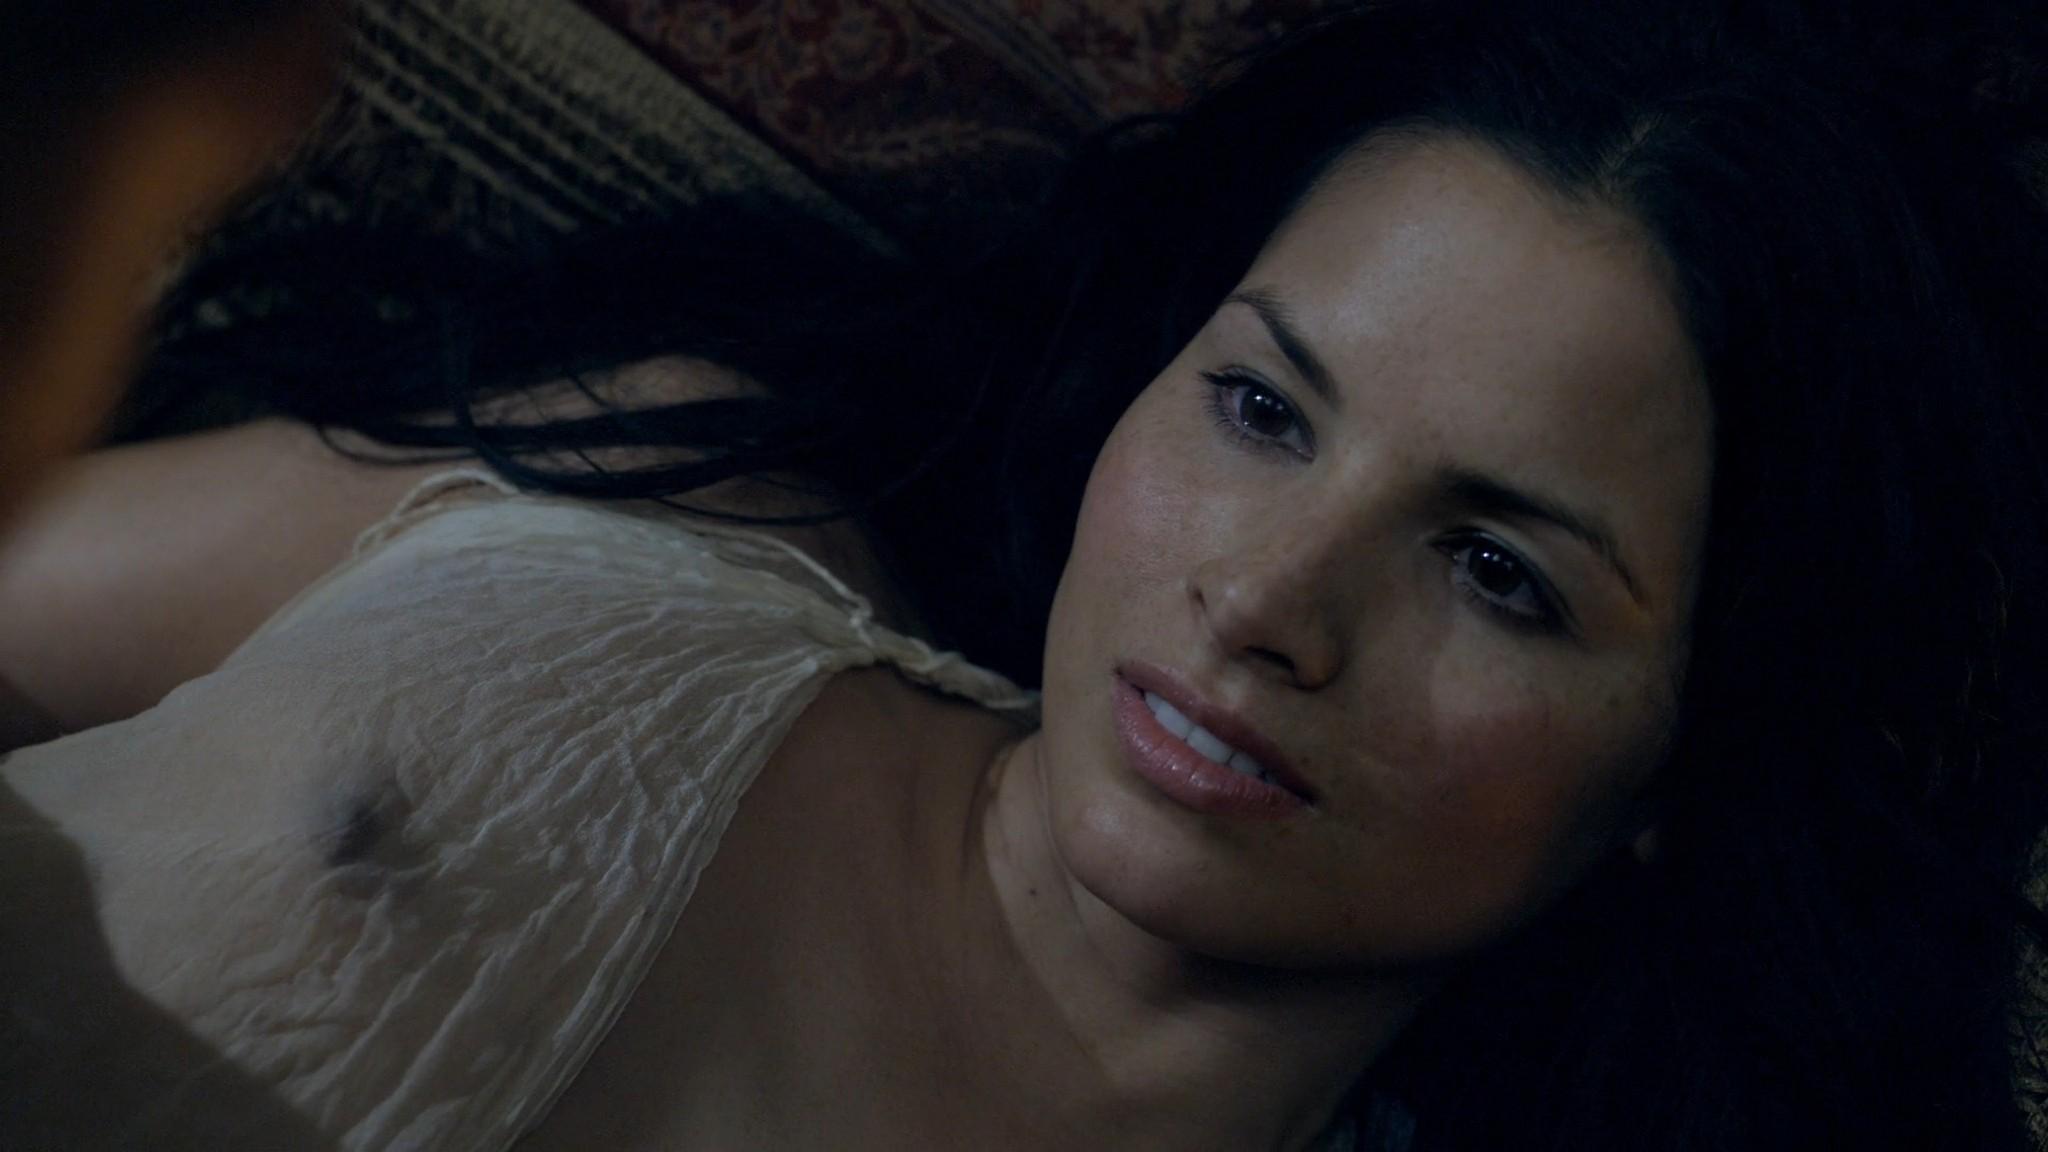 Viva Bianca nude Katrina Law, Bonnie Sveen all nude -Spartacus - Vengeance (2012) e2 1080p (5)